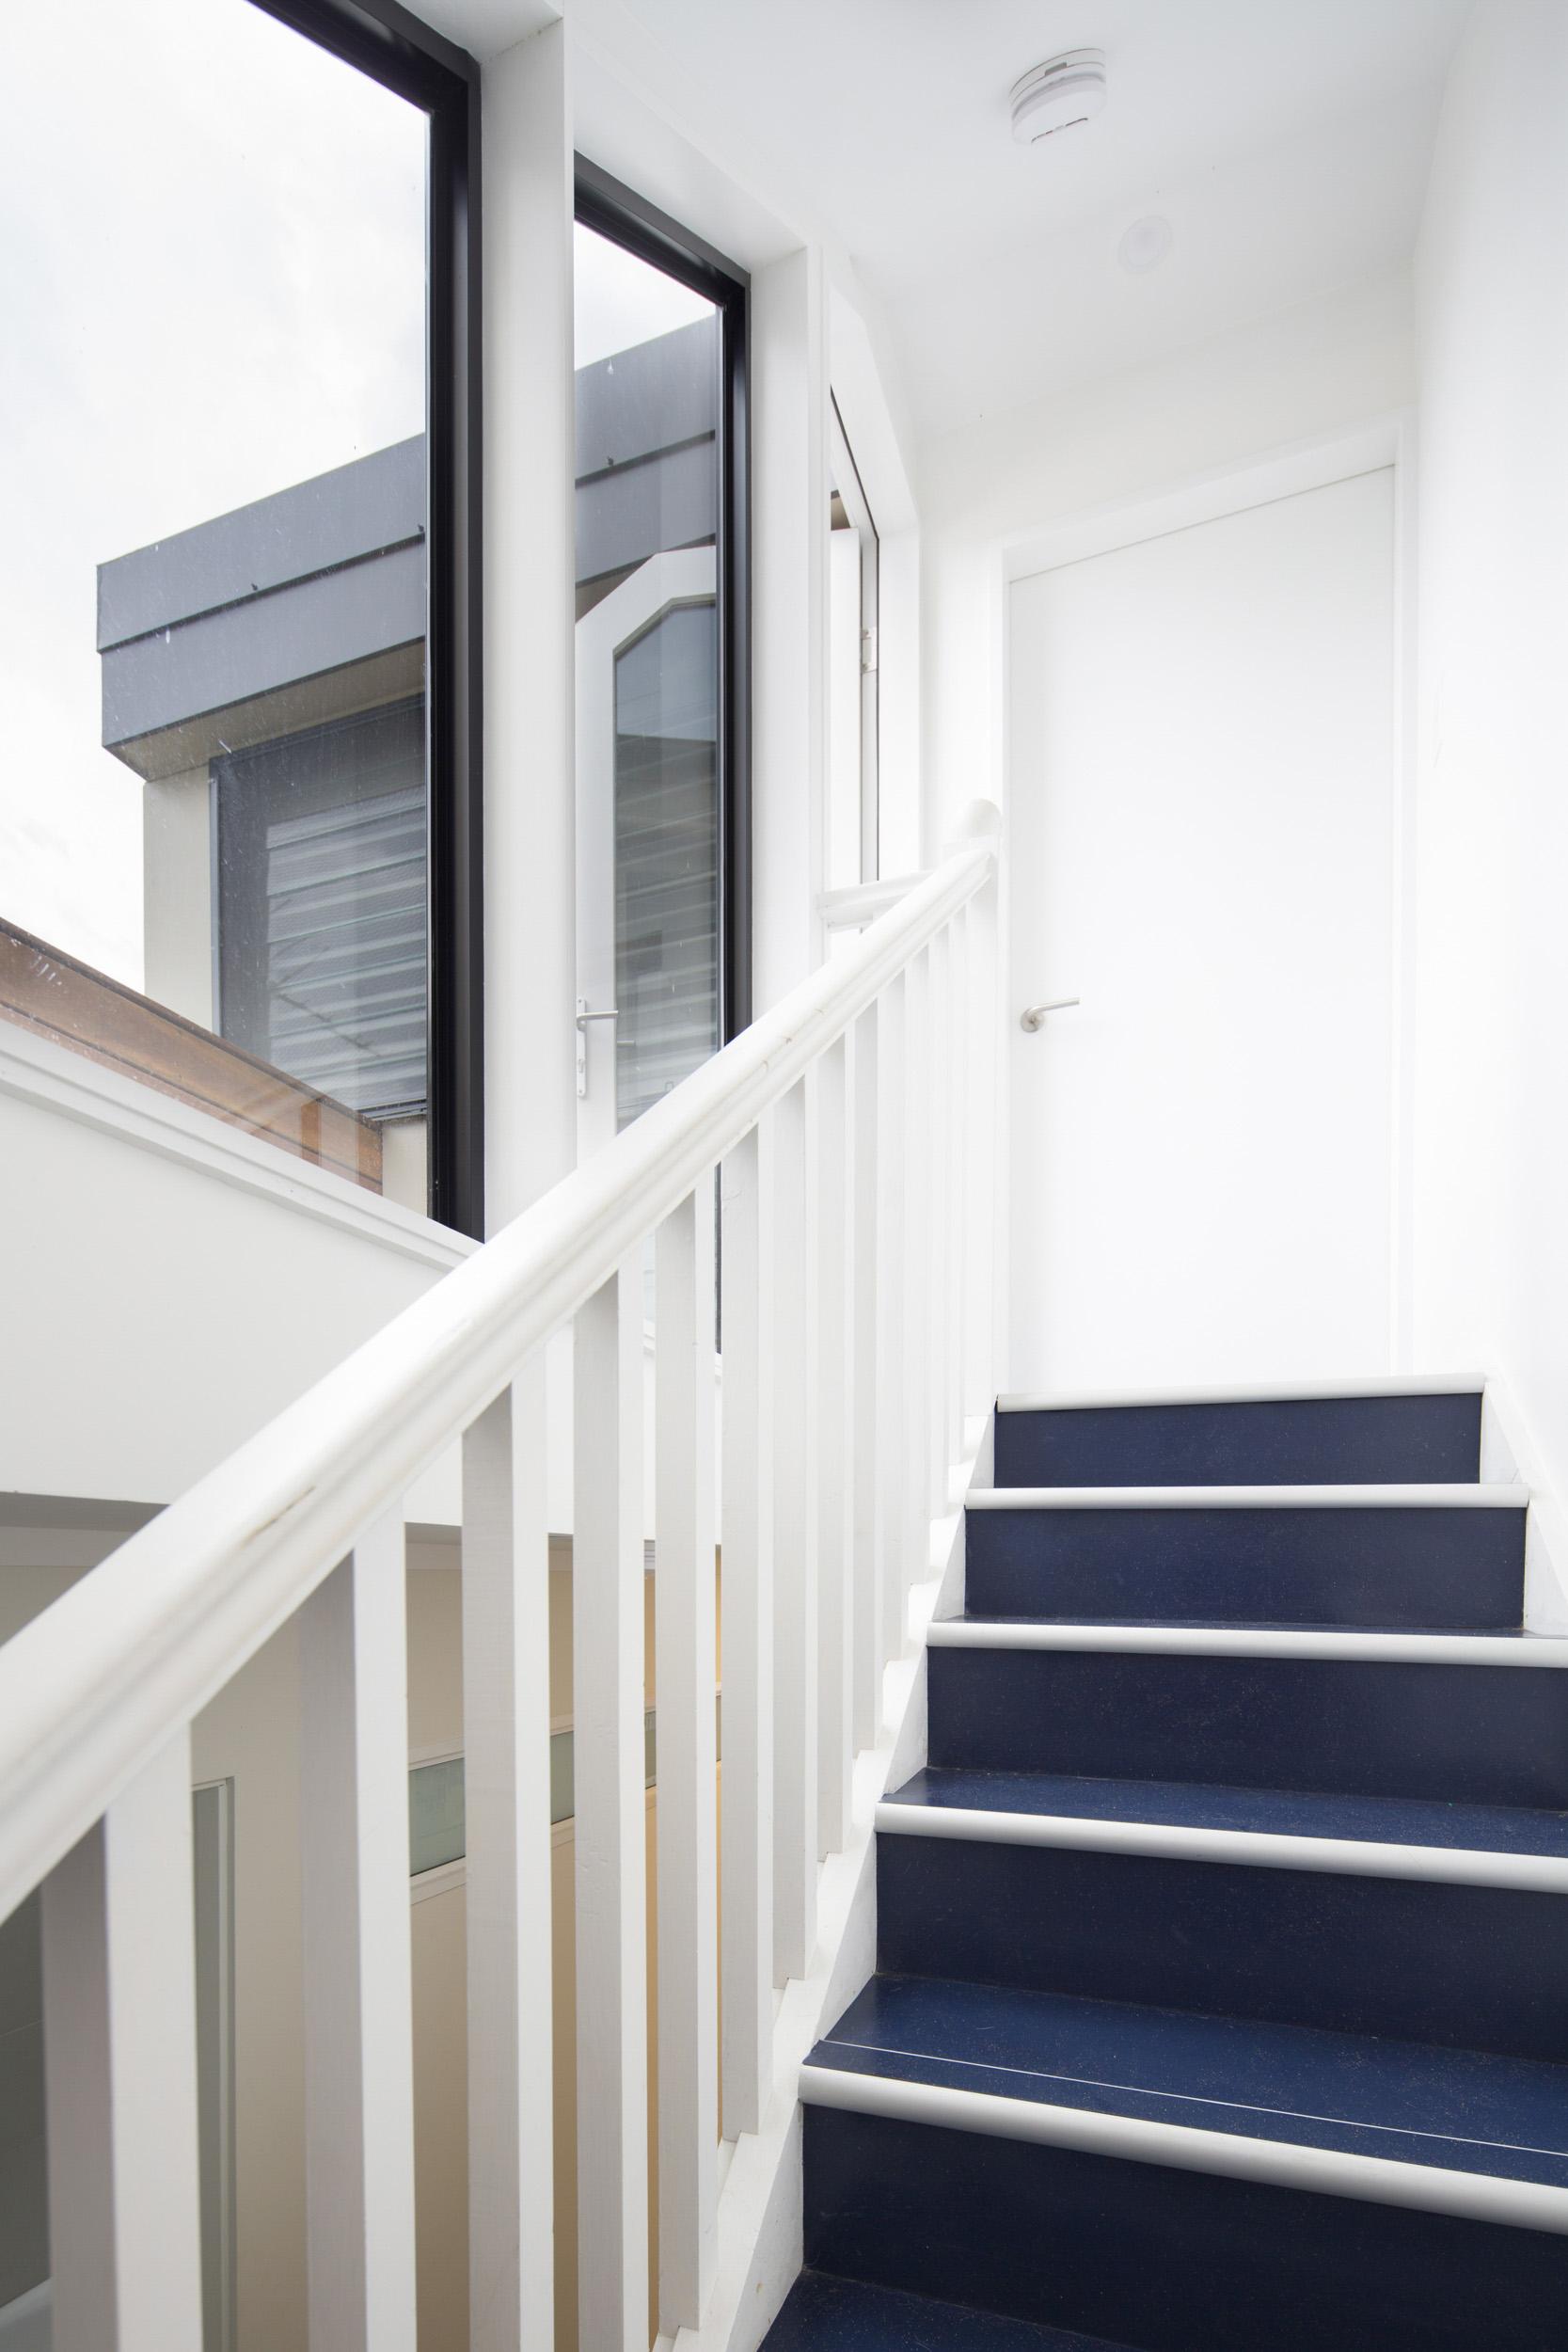 residential_architecture_sydney_australia_07.jpg